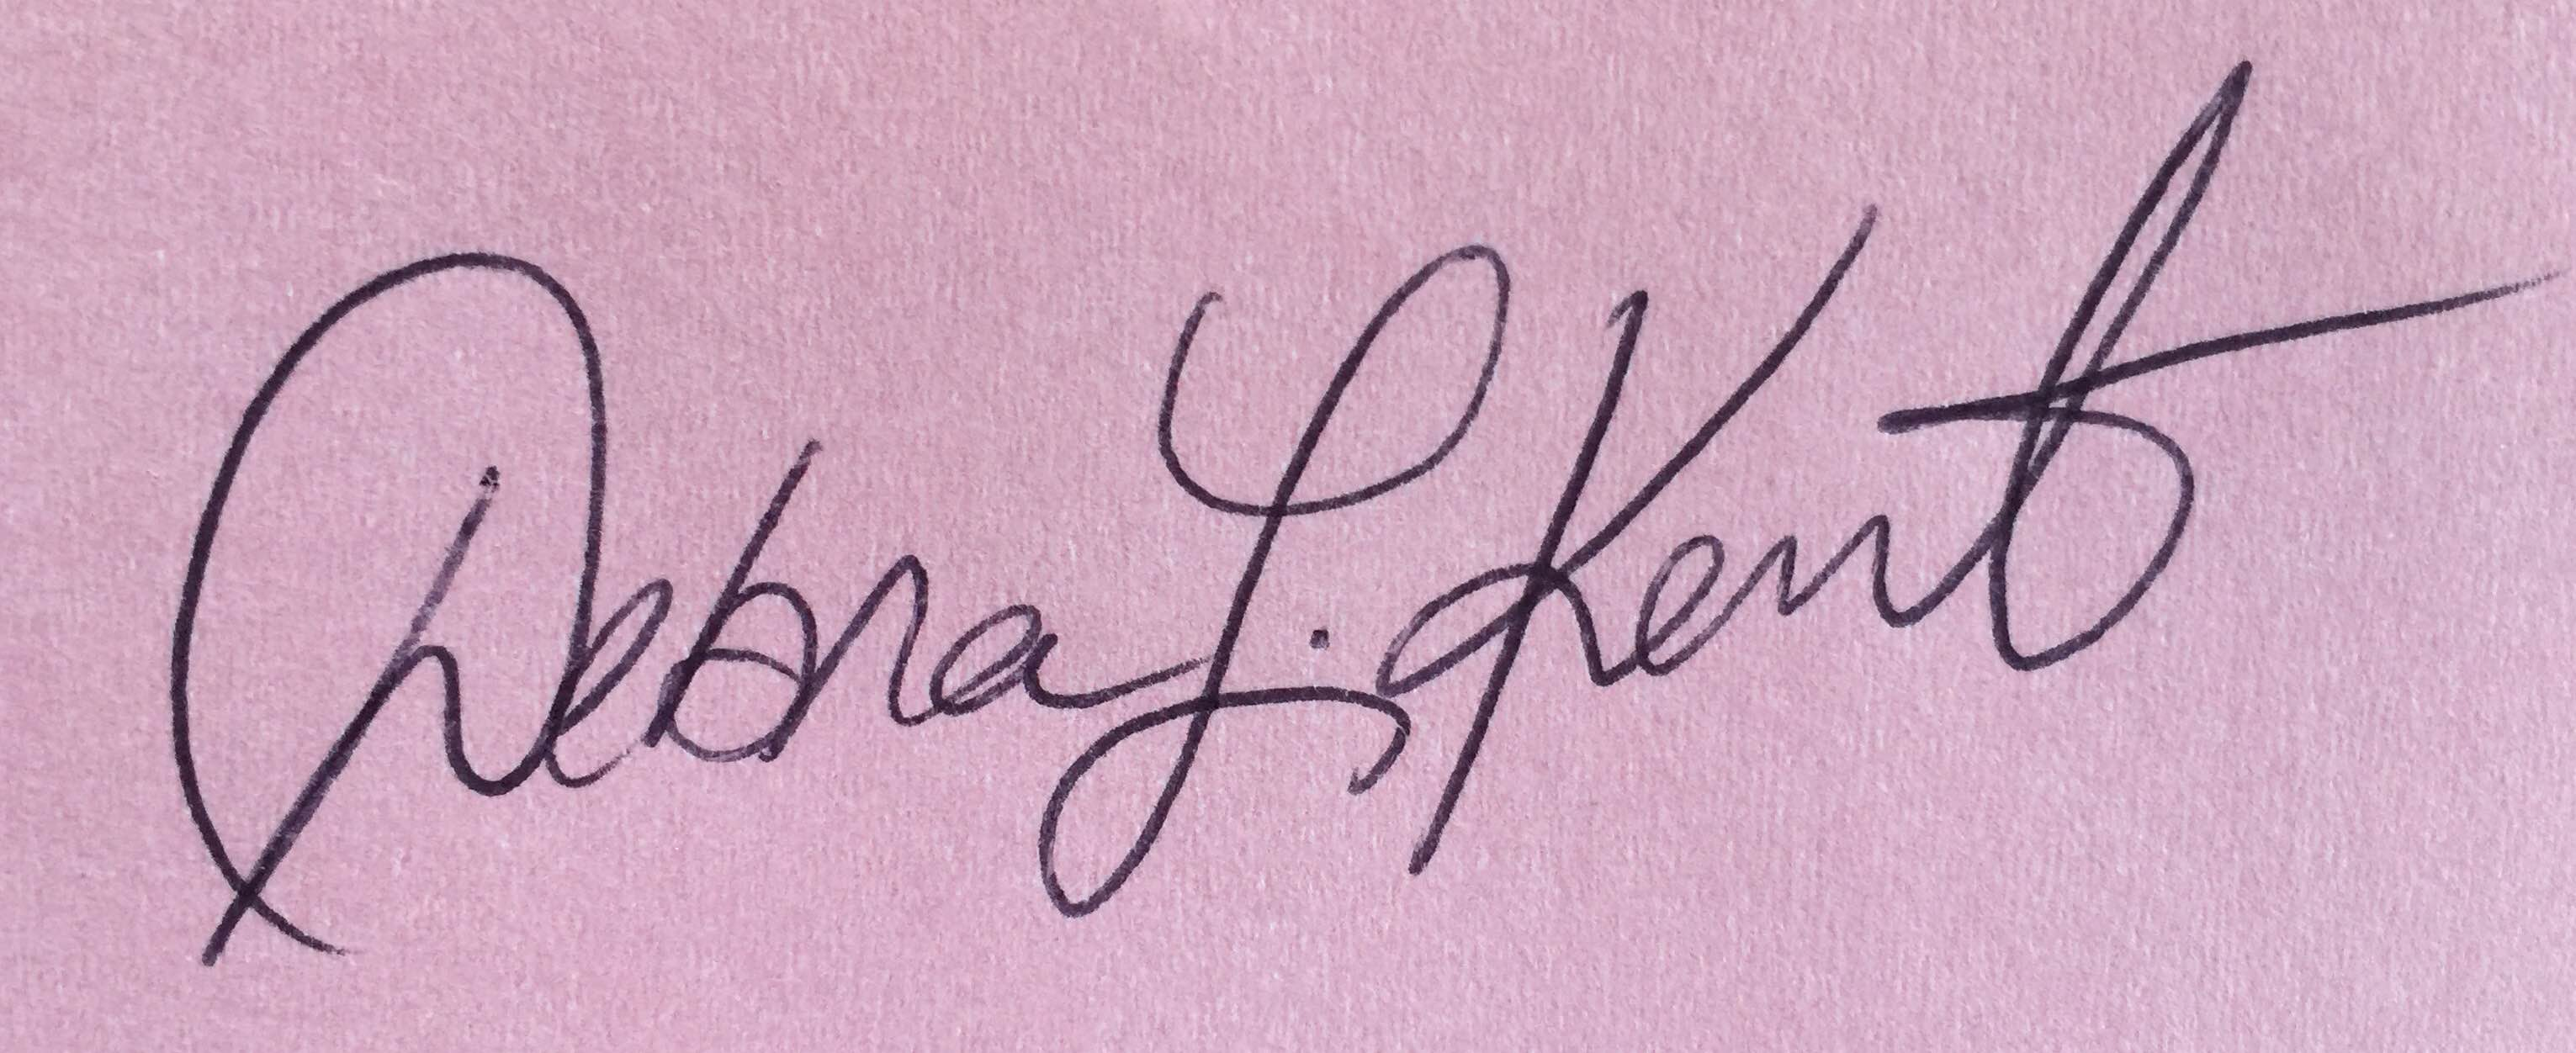 Debra Kent's Signature